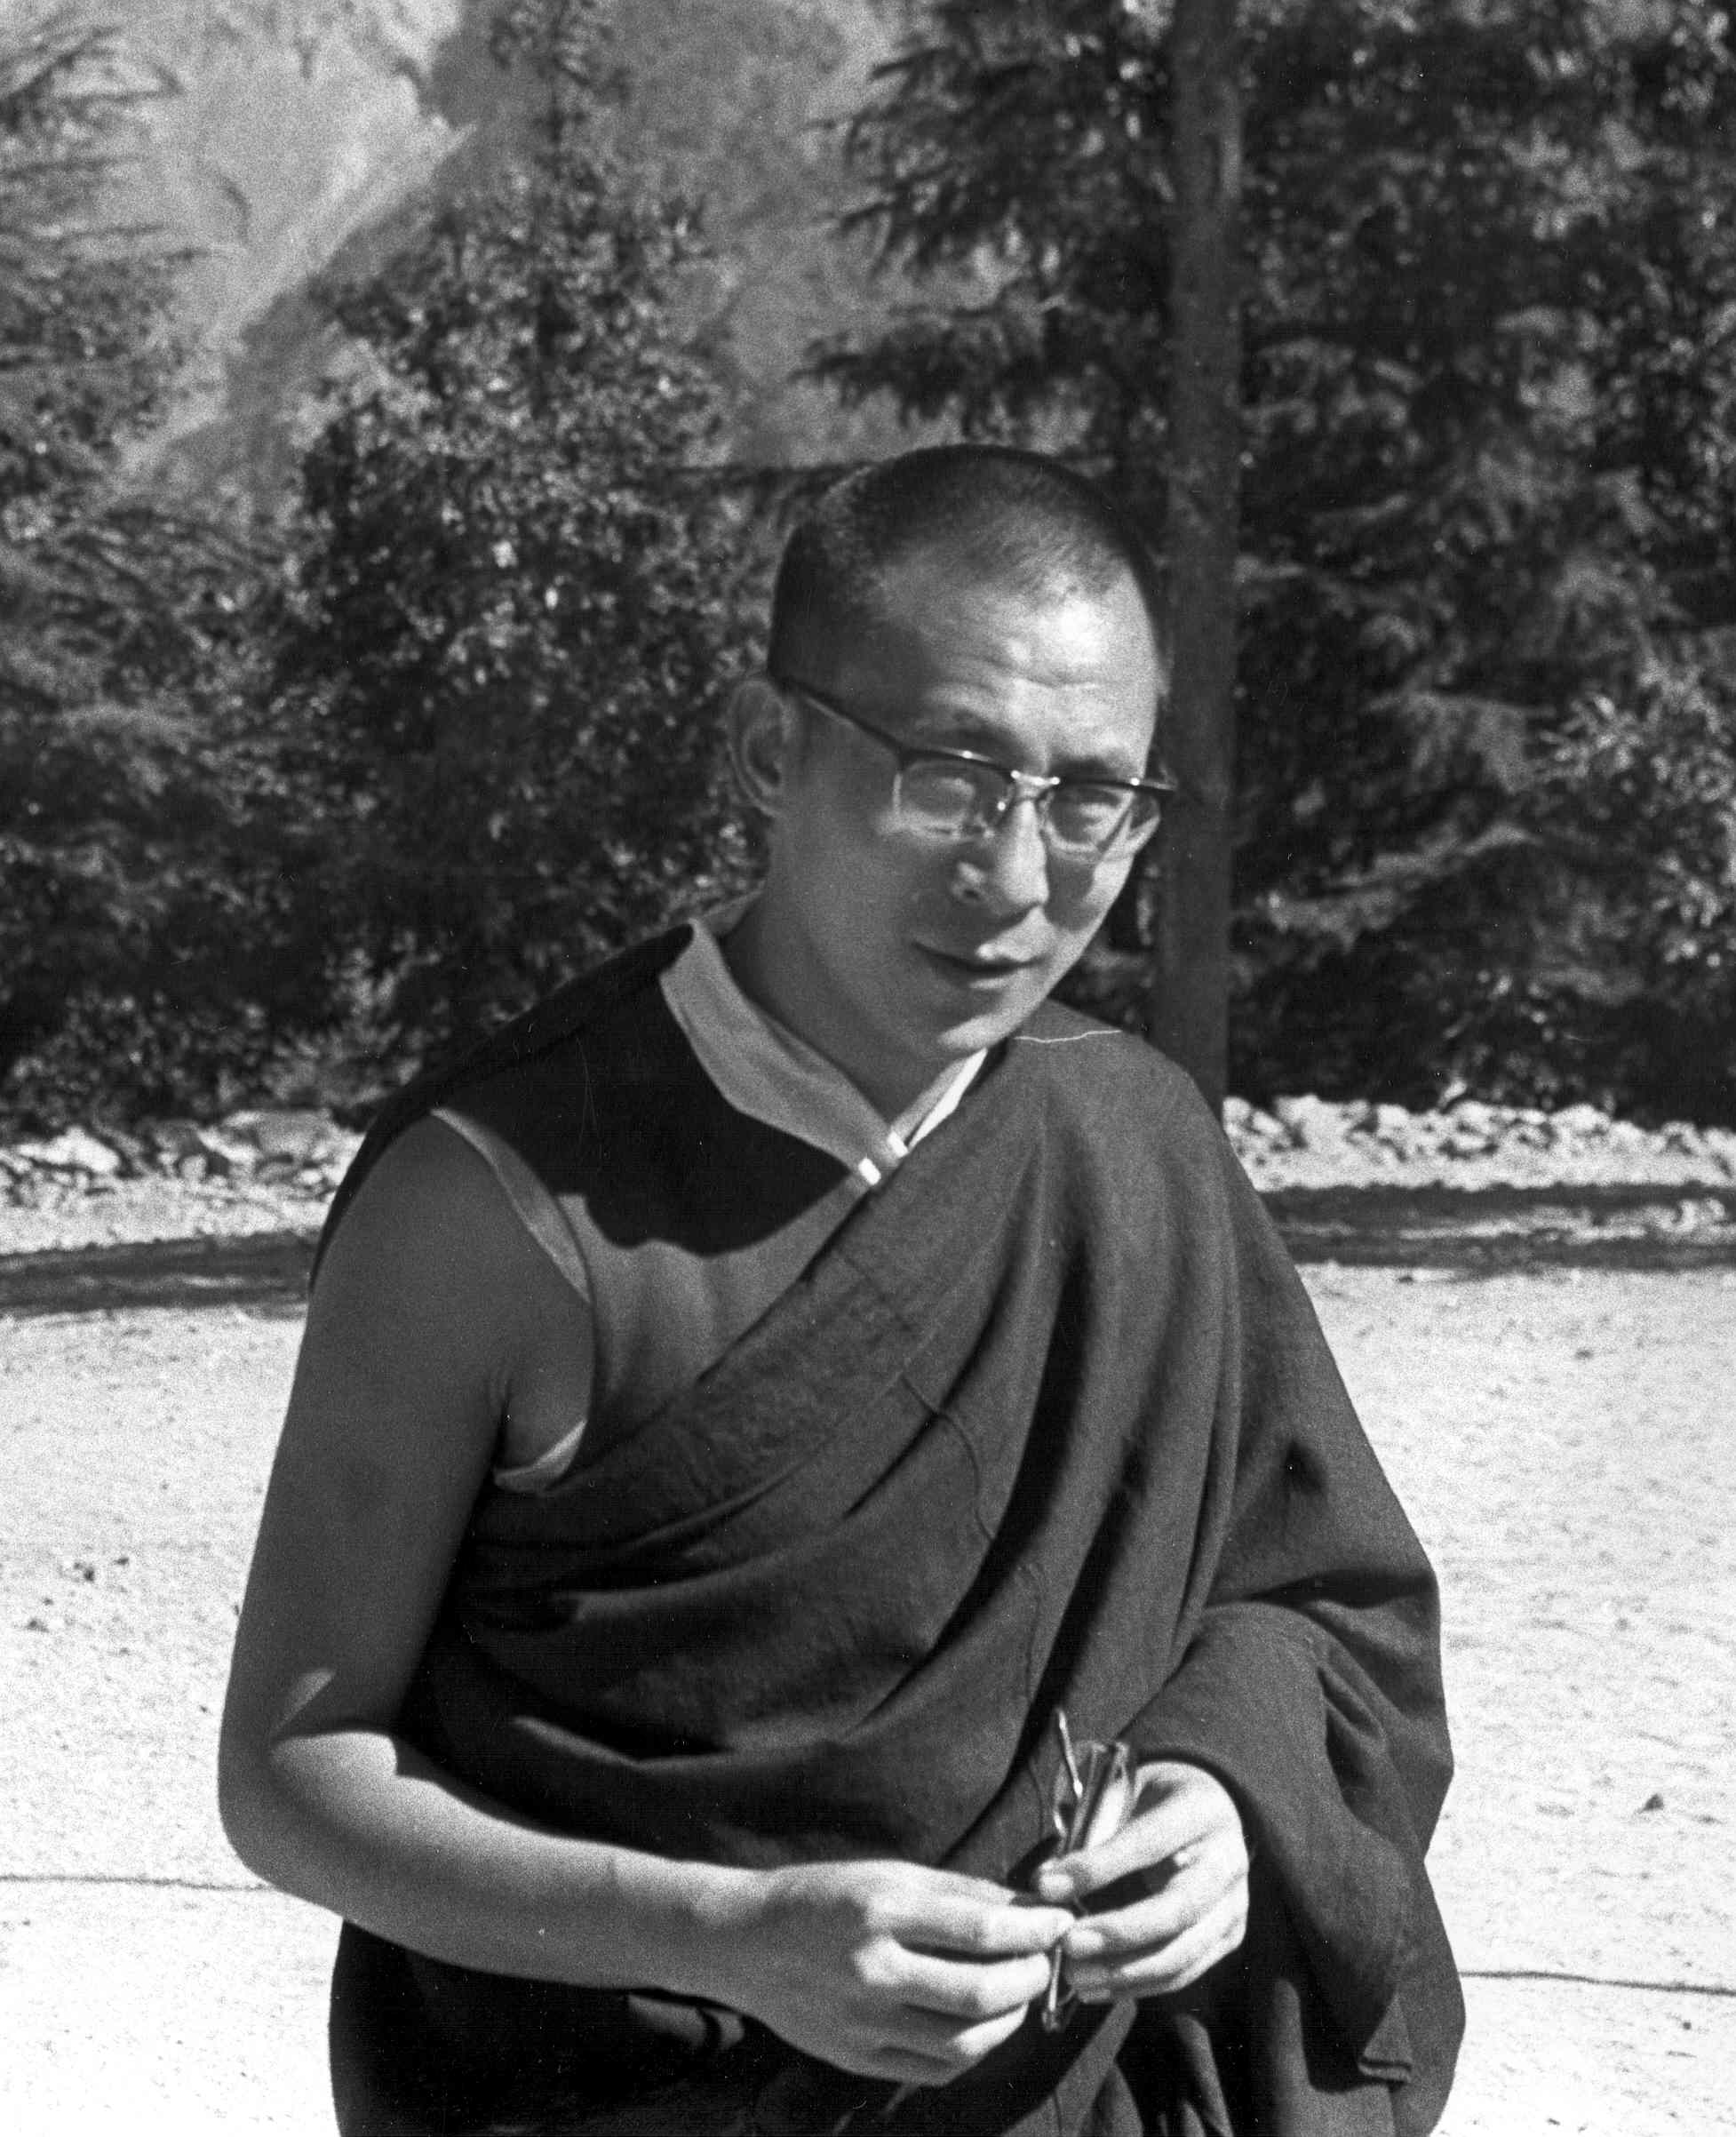 Thomas Merton and the Dalai Lama - Thomas Merton Center